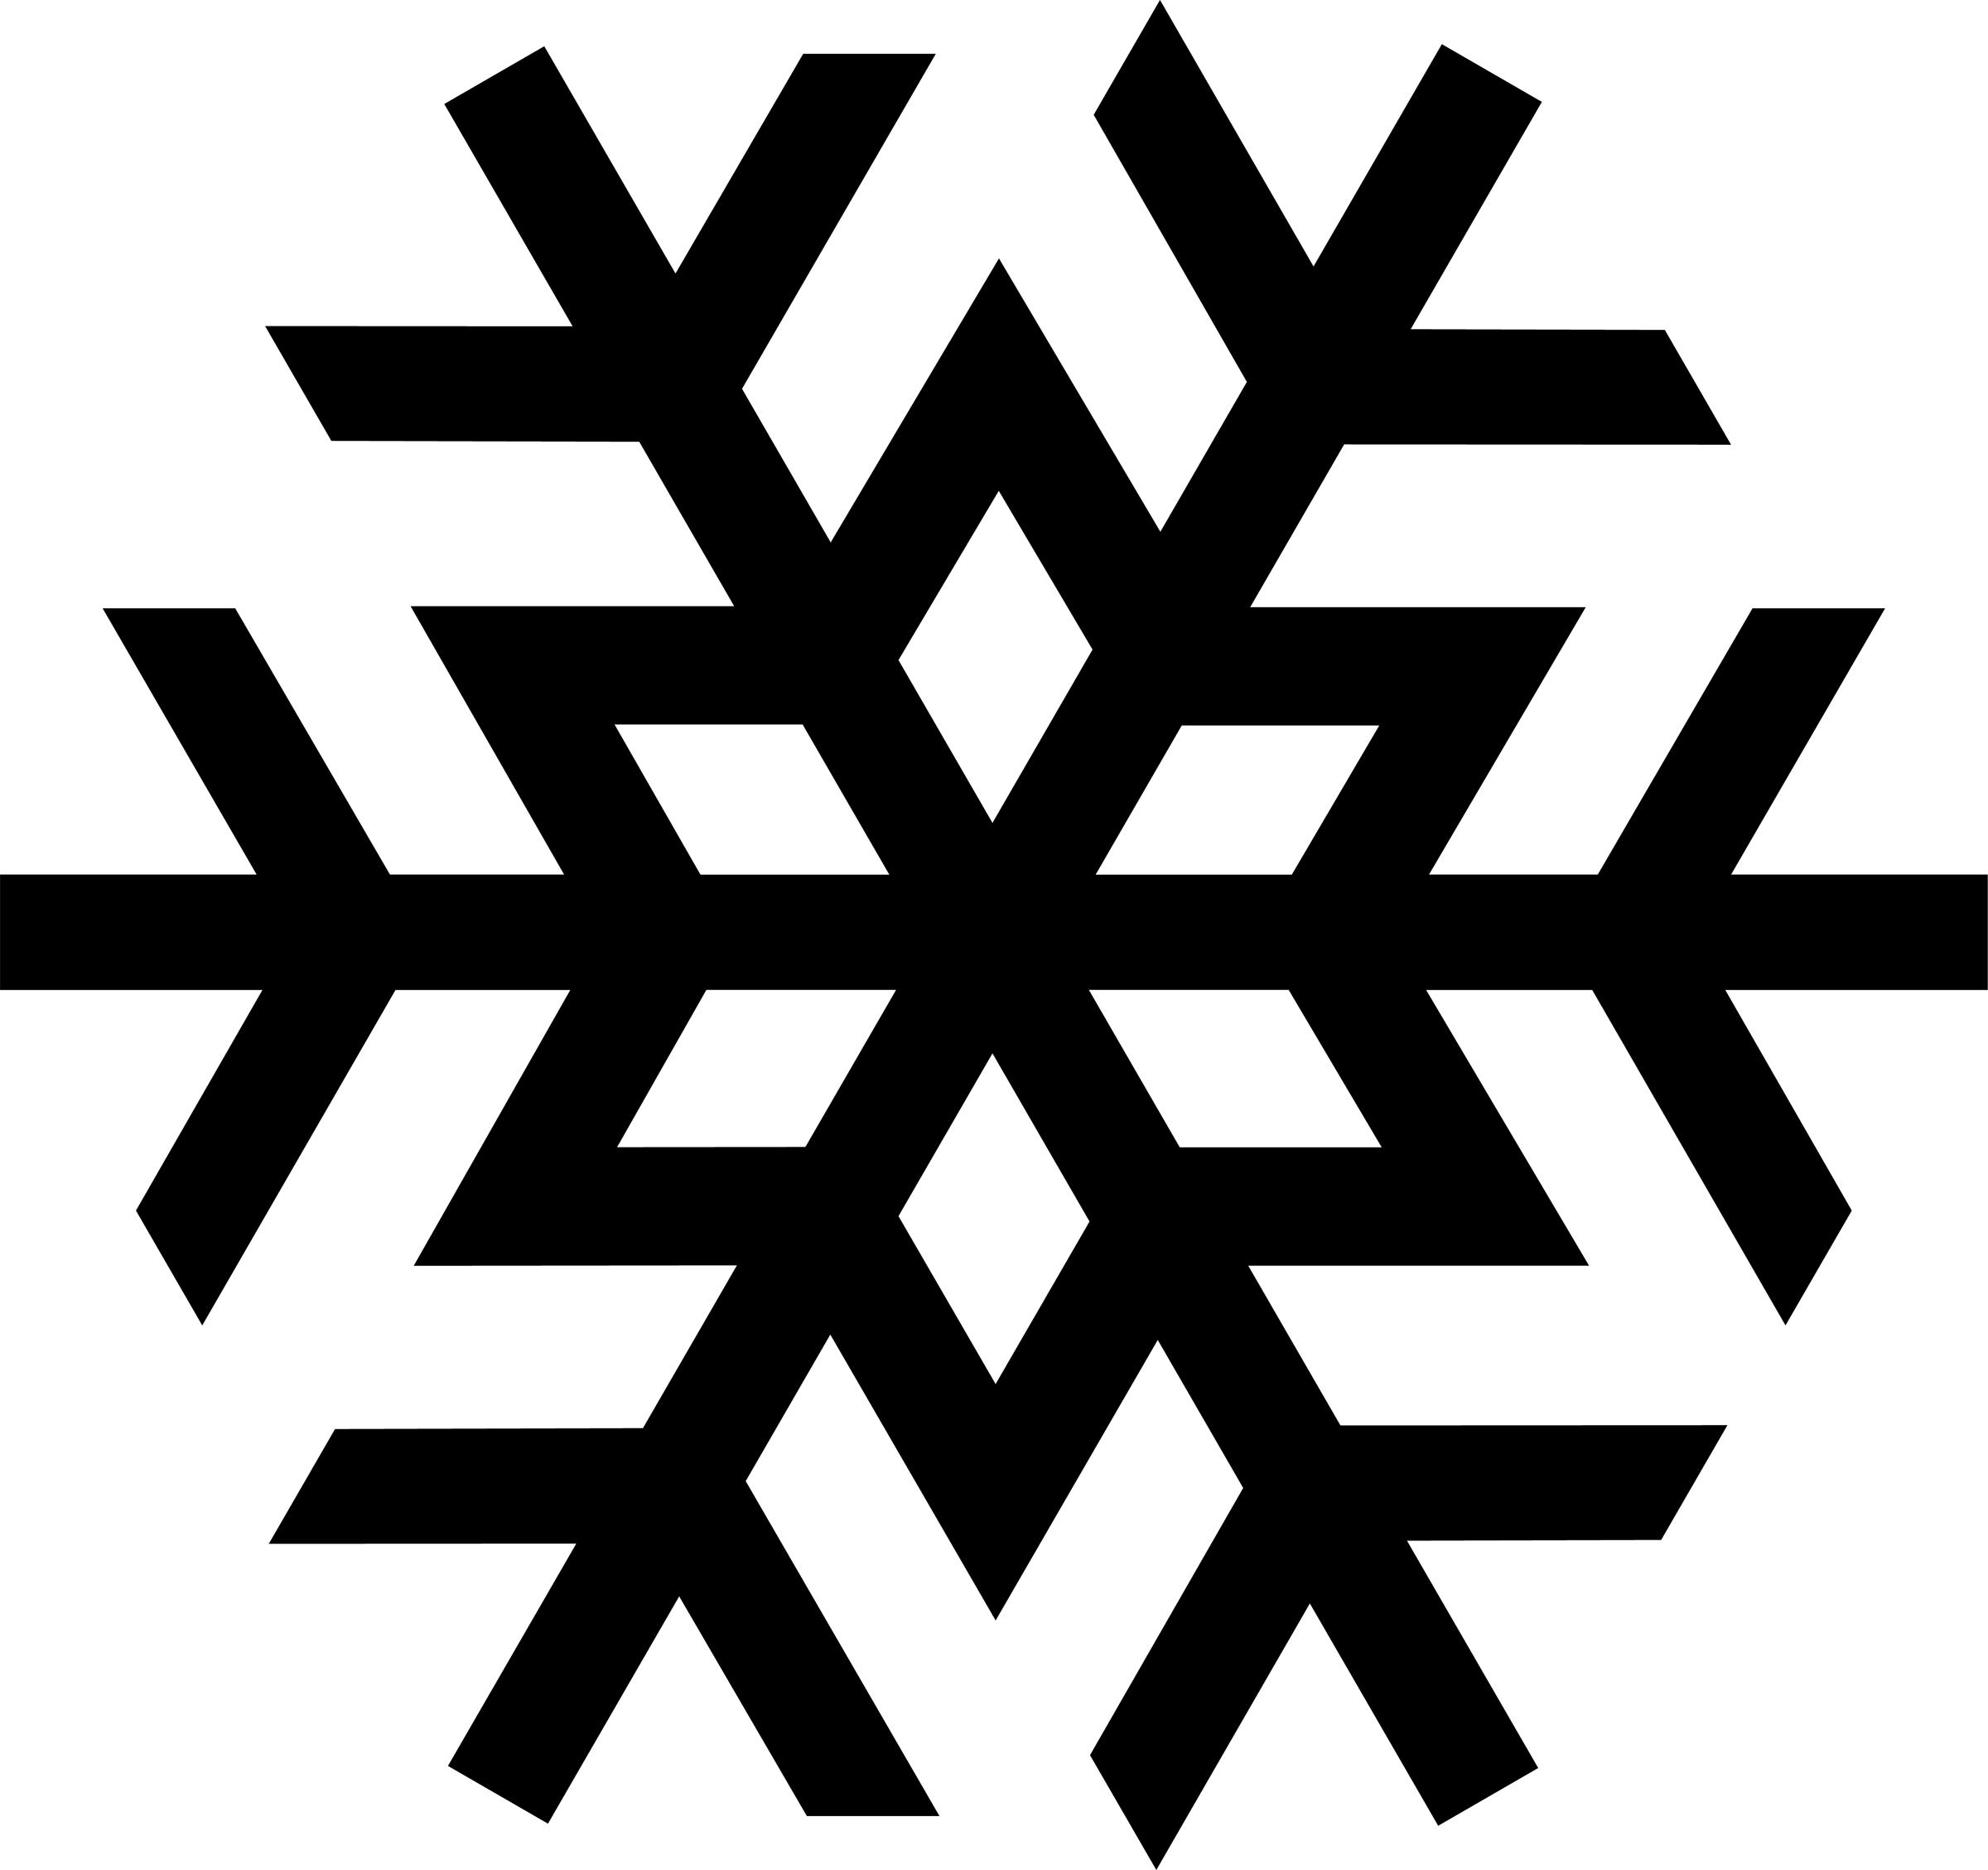 Black Snowflake Clipart Biye6ogil Jpeg